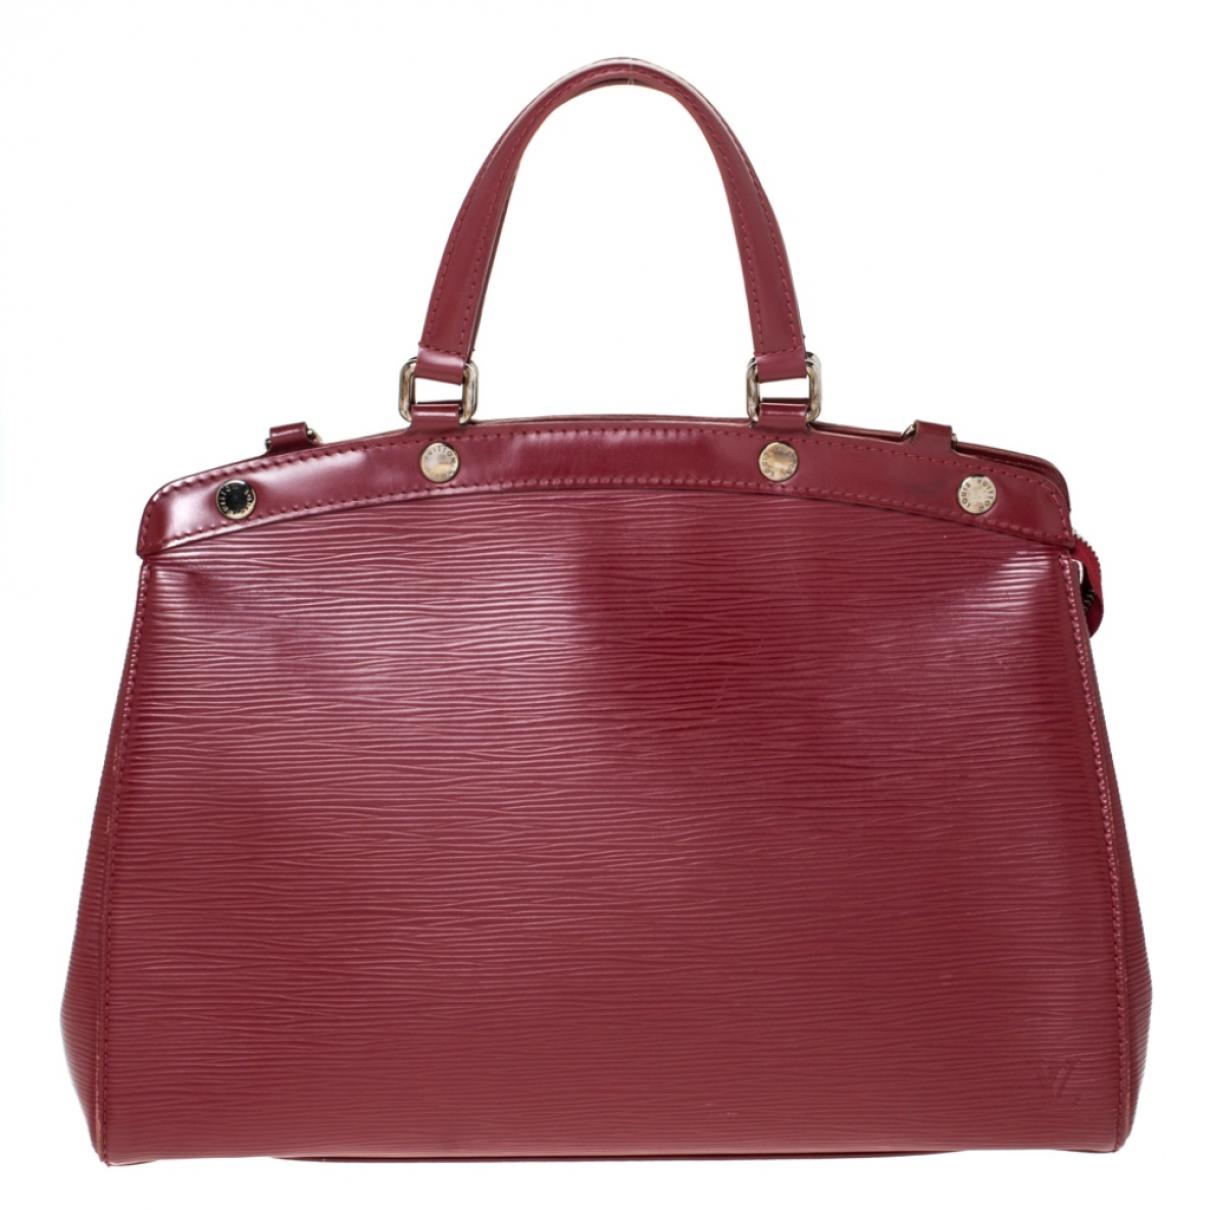 Louis Vuitton Brea Handtasche in Leder